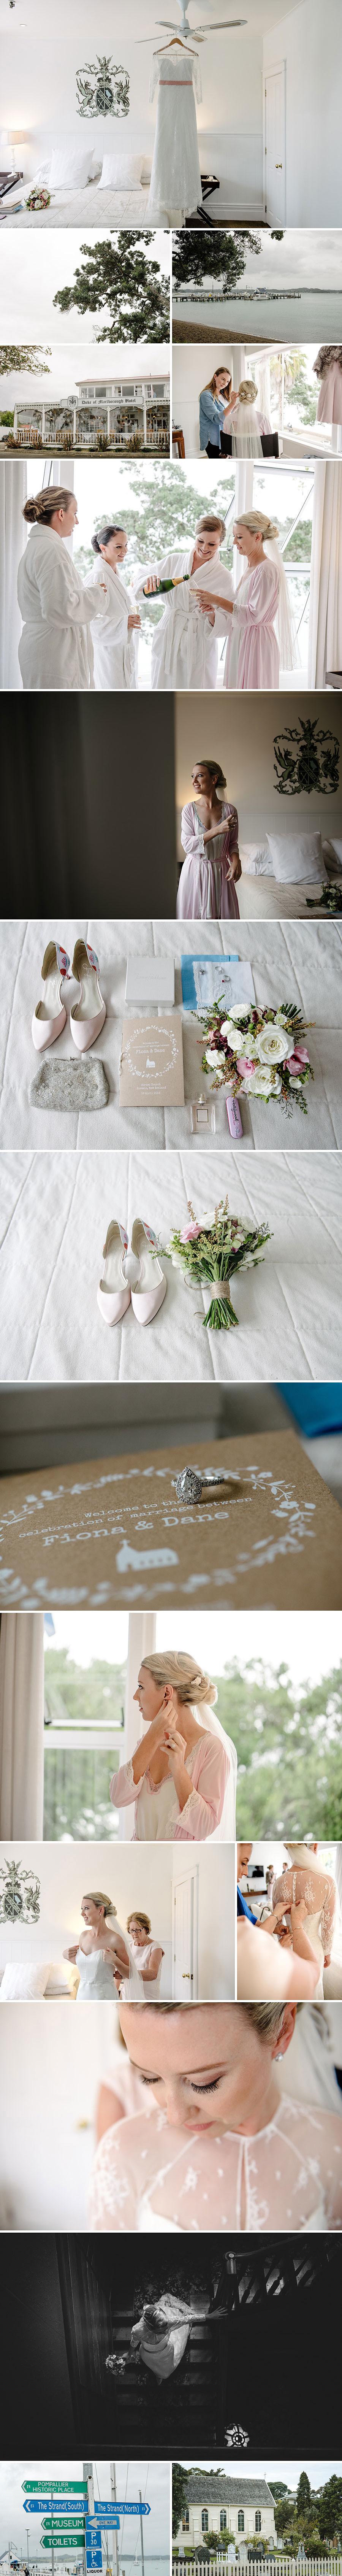 Russell Wedding, Photographer Jess Burges, Northland New Zealand